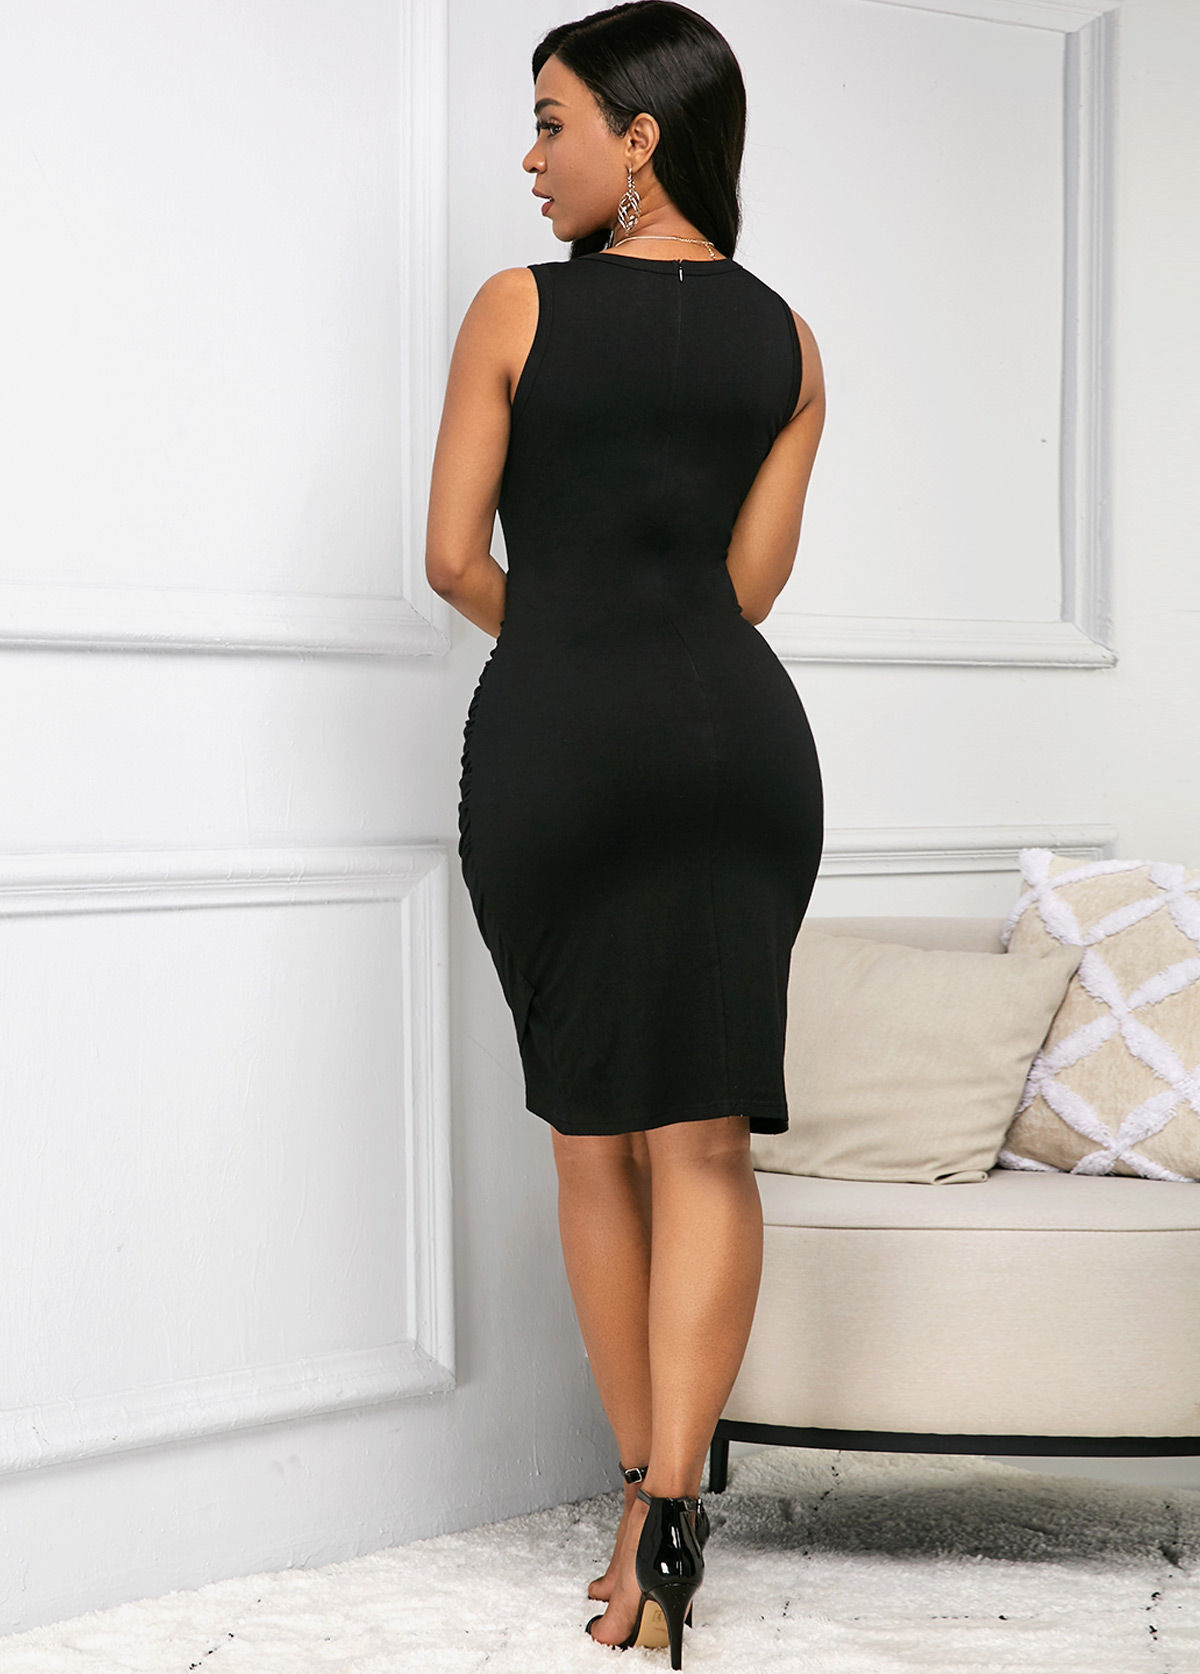 Round Neck Sleeveless Black Soft Dress